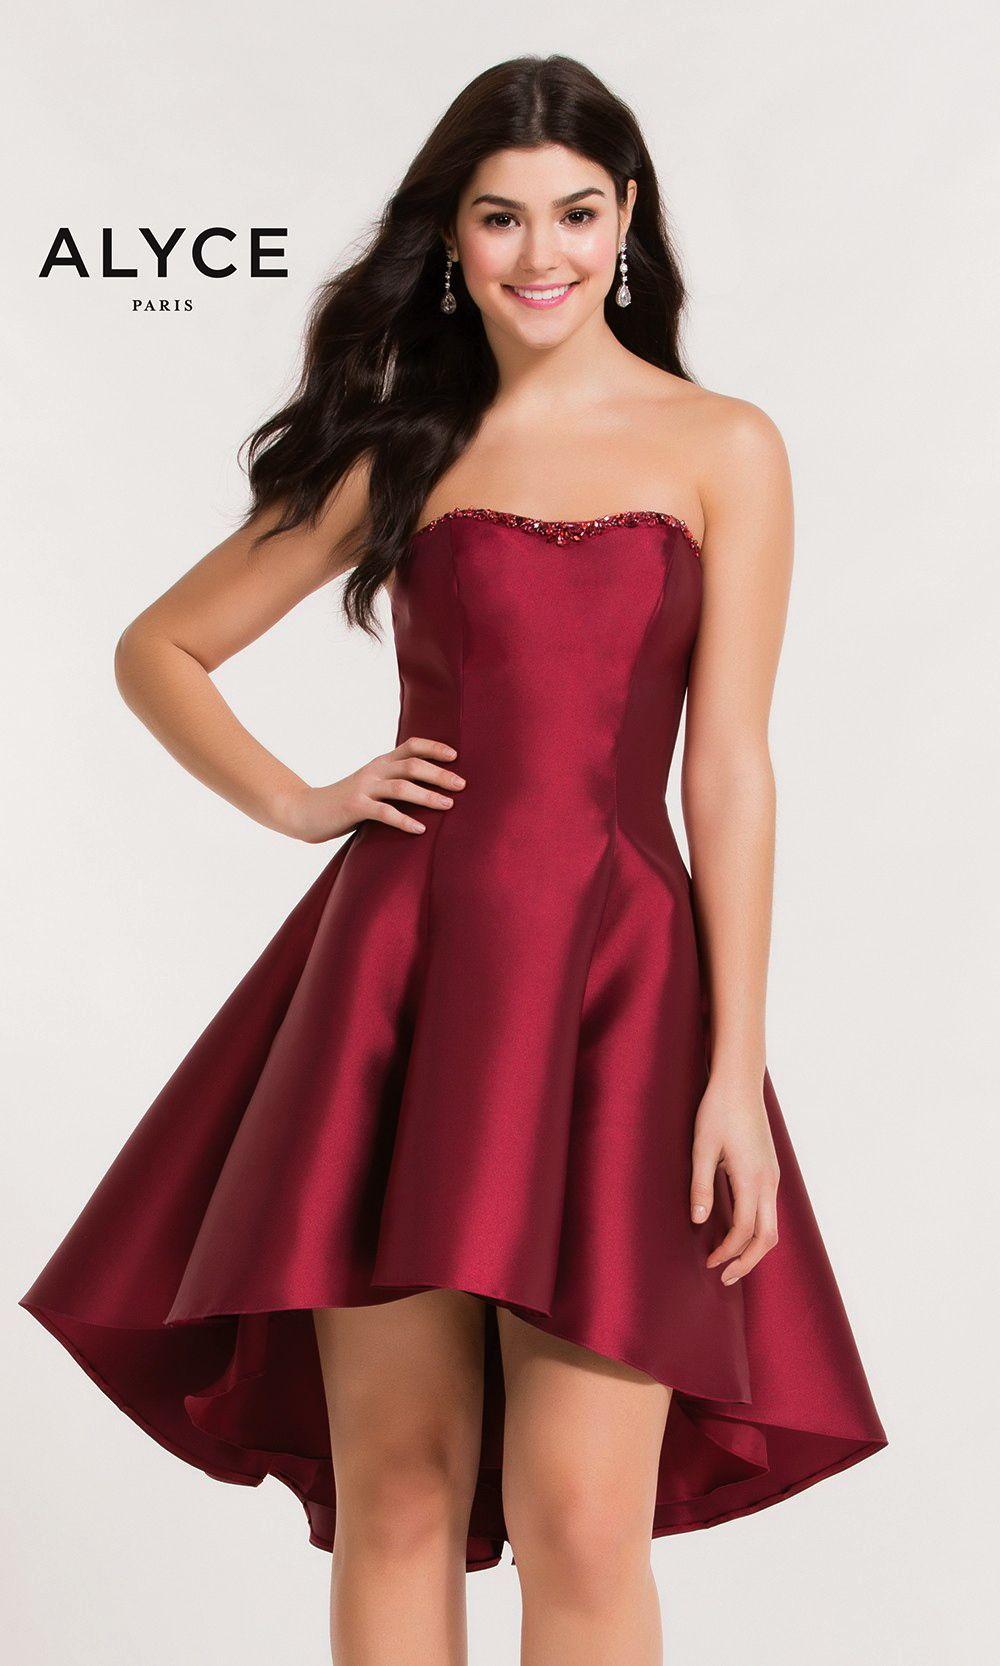 Short evening dresses homecoming dresses by alyce parisucbrueaay